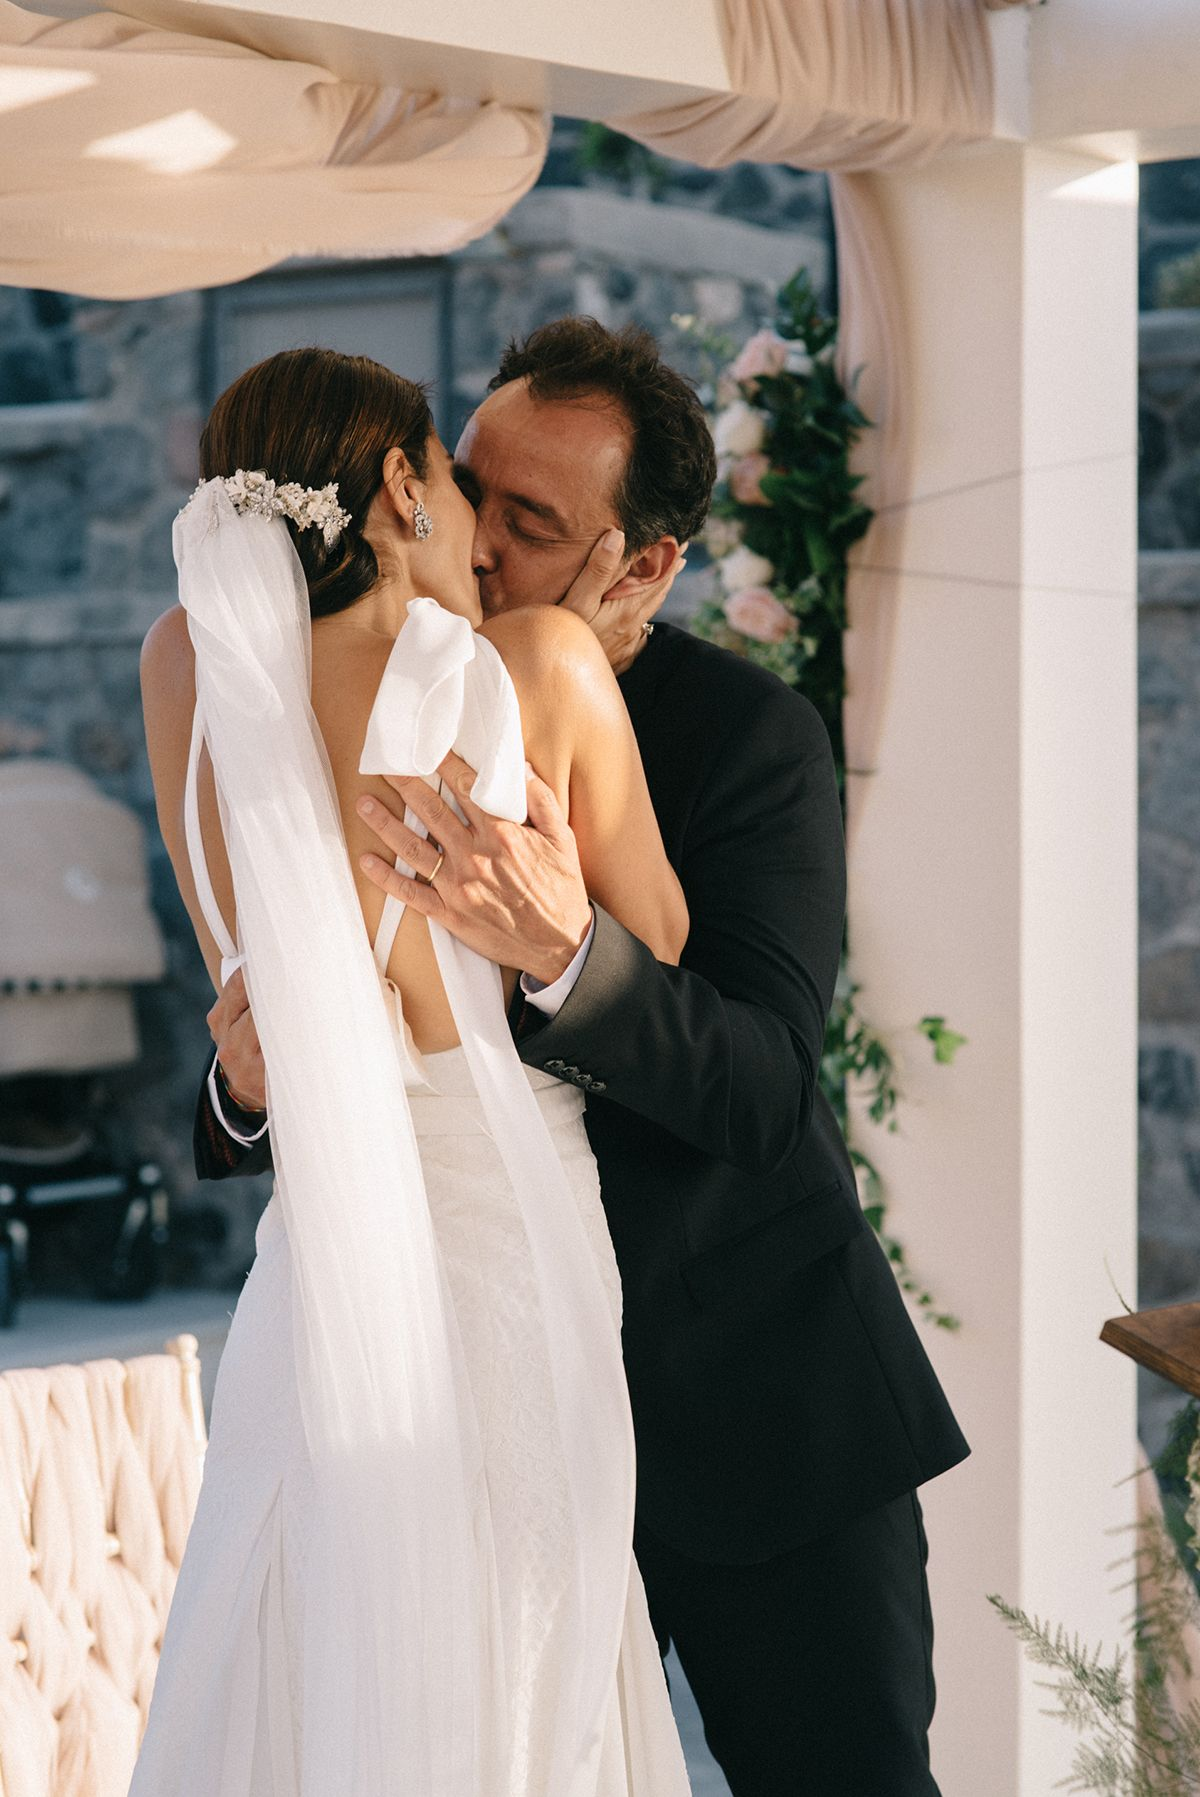 La-boda-de-MarC3ADa-JosC3A9-SuC3A1rez-y-Jordi-Nieto-130.jpg